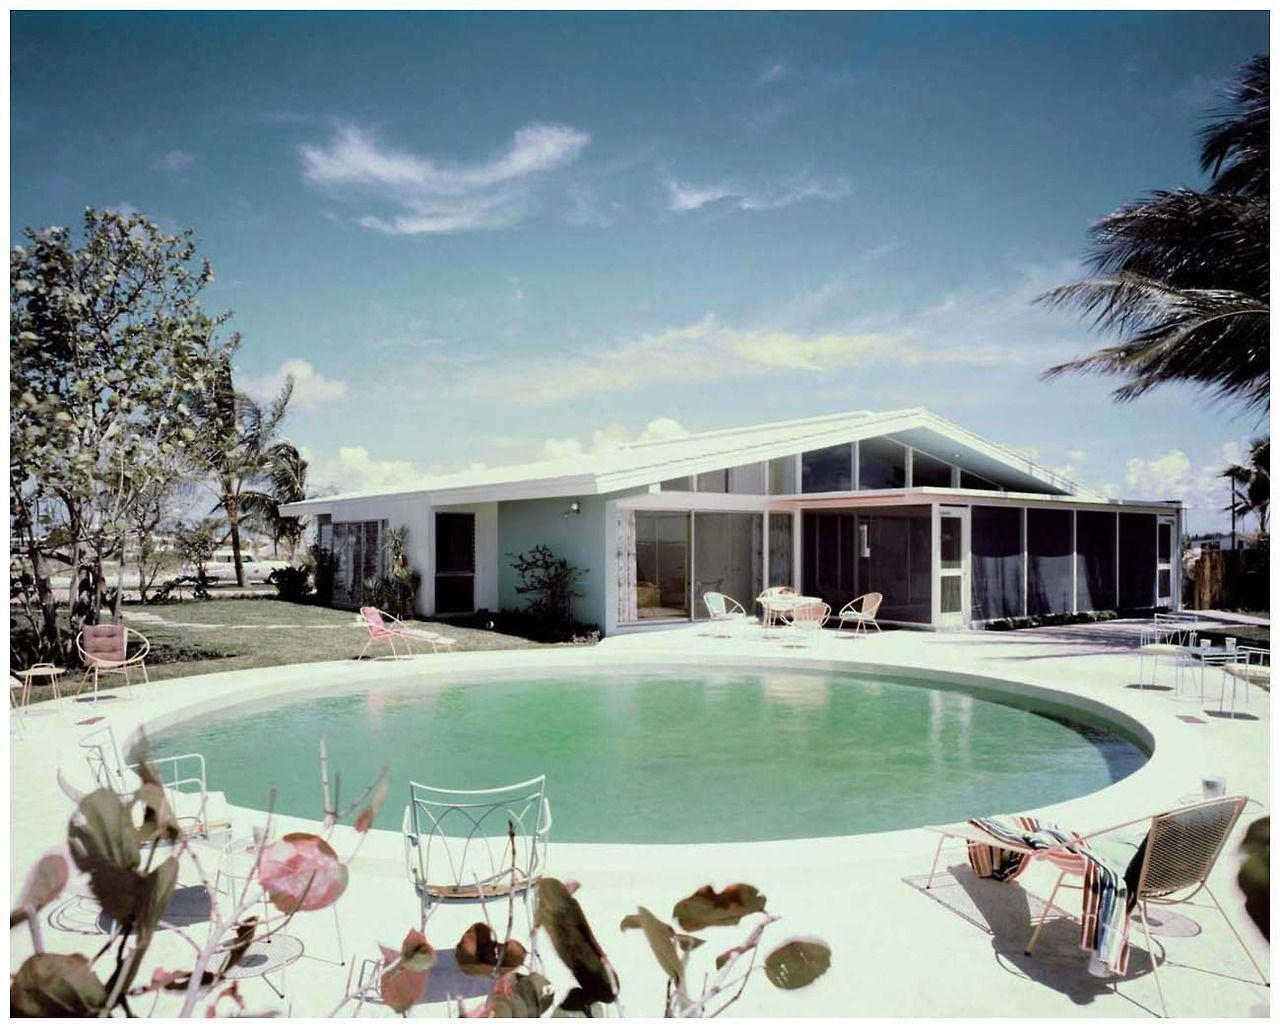 General electric wonder house miami florida architect